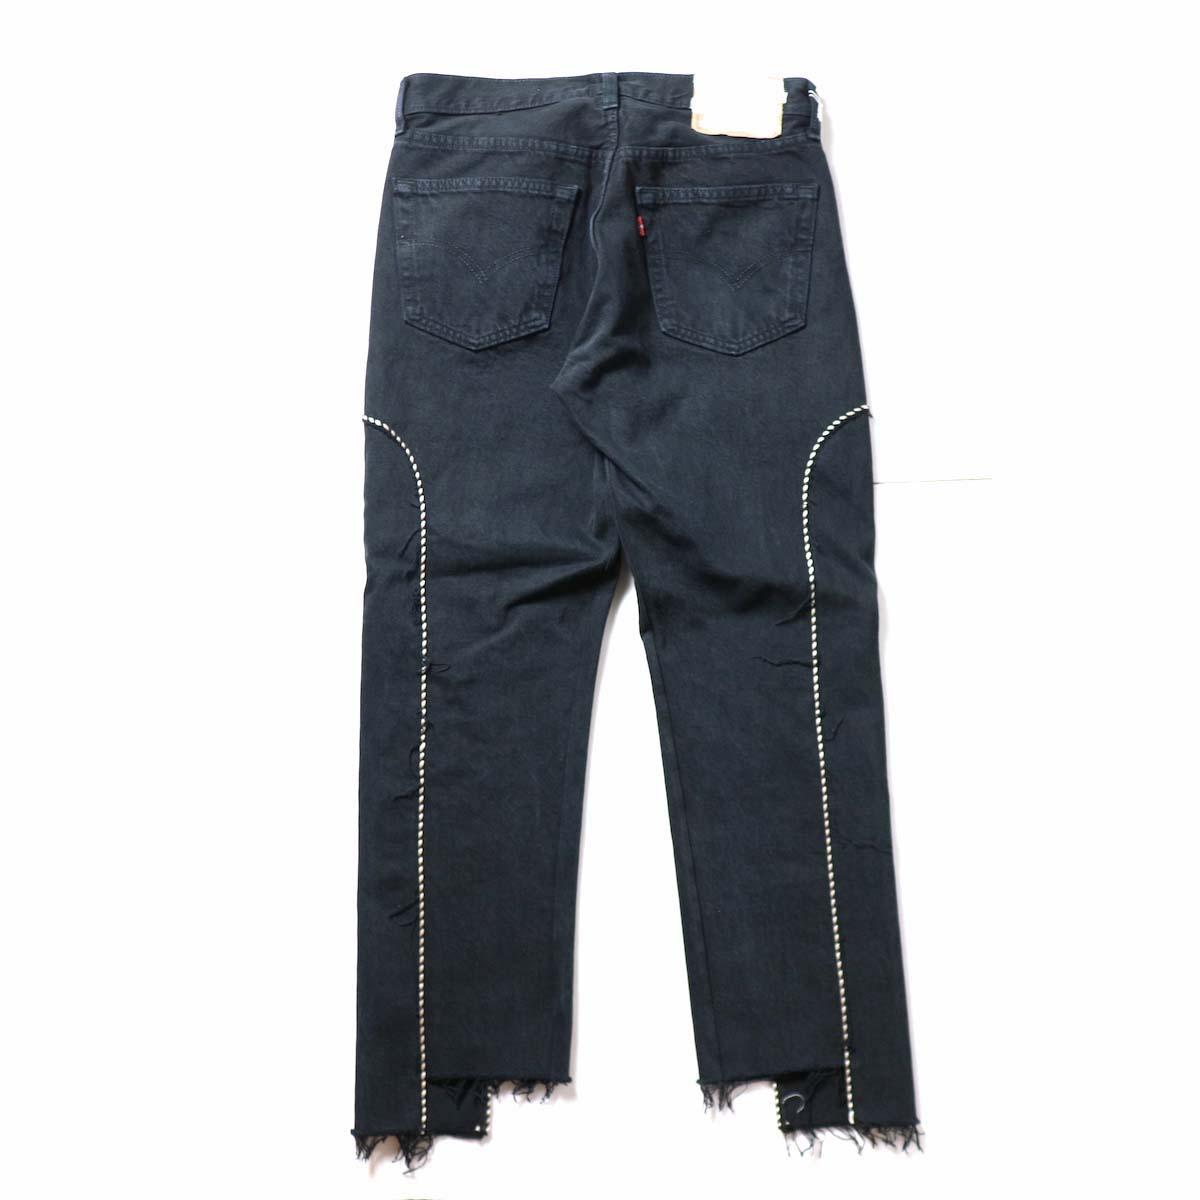 OLD PARK / Western Jeans Black (Msize-F)背面